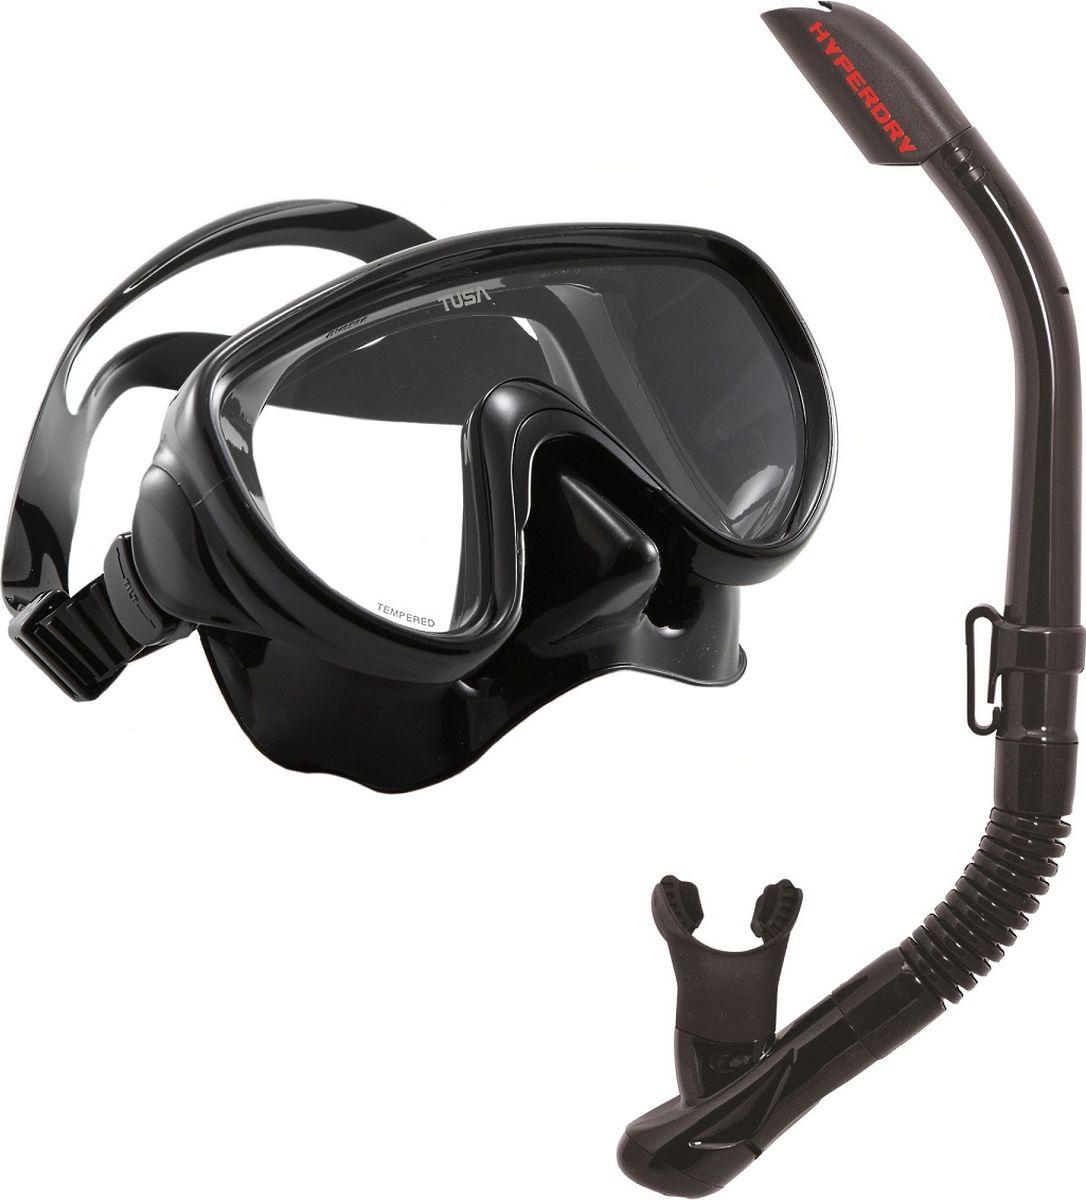 Набор для плавания Tusa Sport, цвет: черный. UCR-1619BK/BK black diamond фонарь кемпинговый black diamond moji